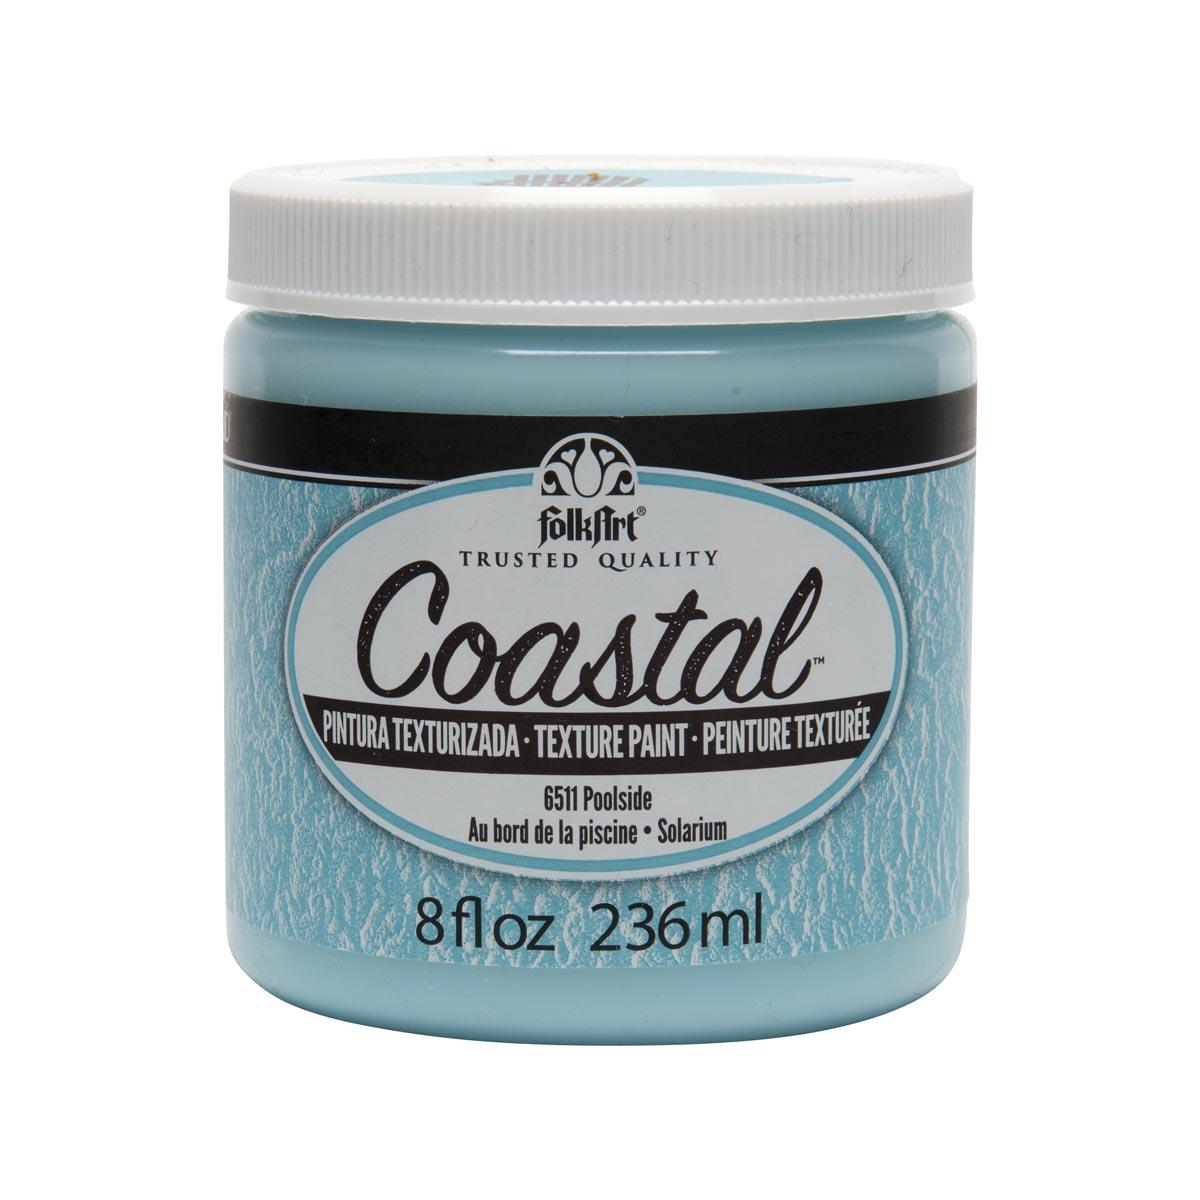 FolkArt ® Coastal™ Texture Paint - Poolside, 8 oz.